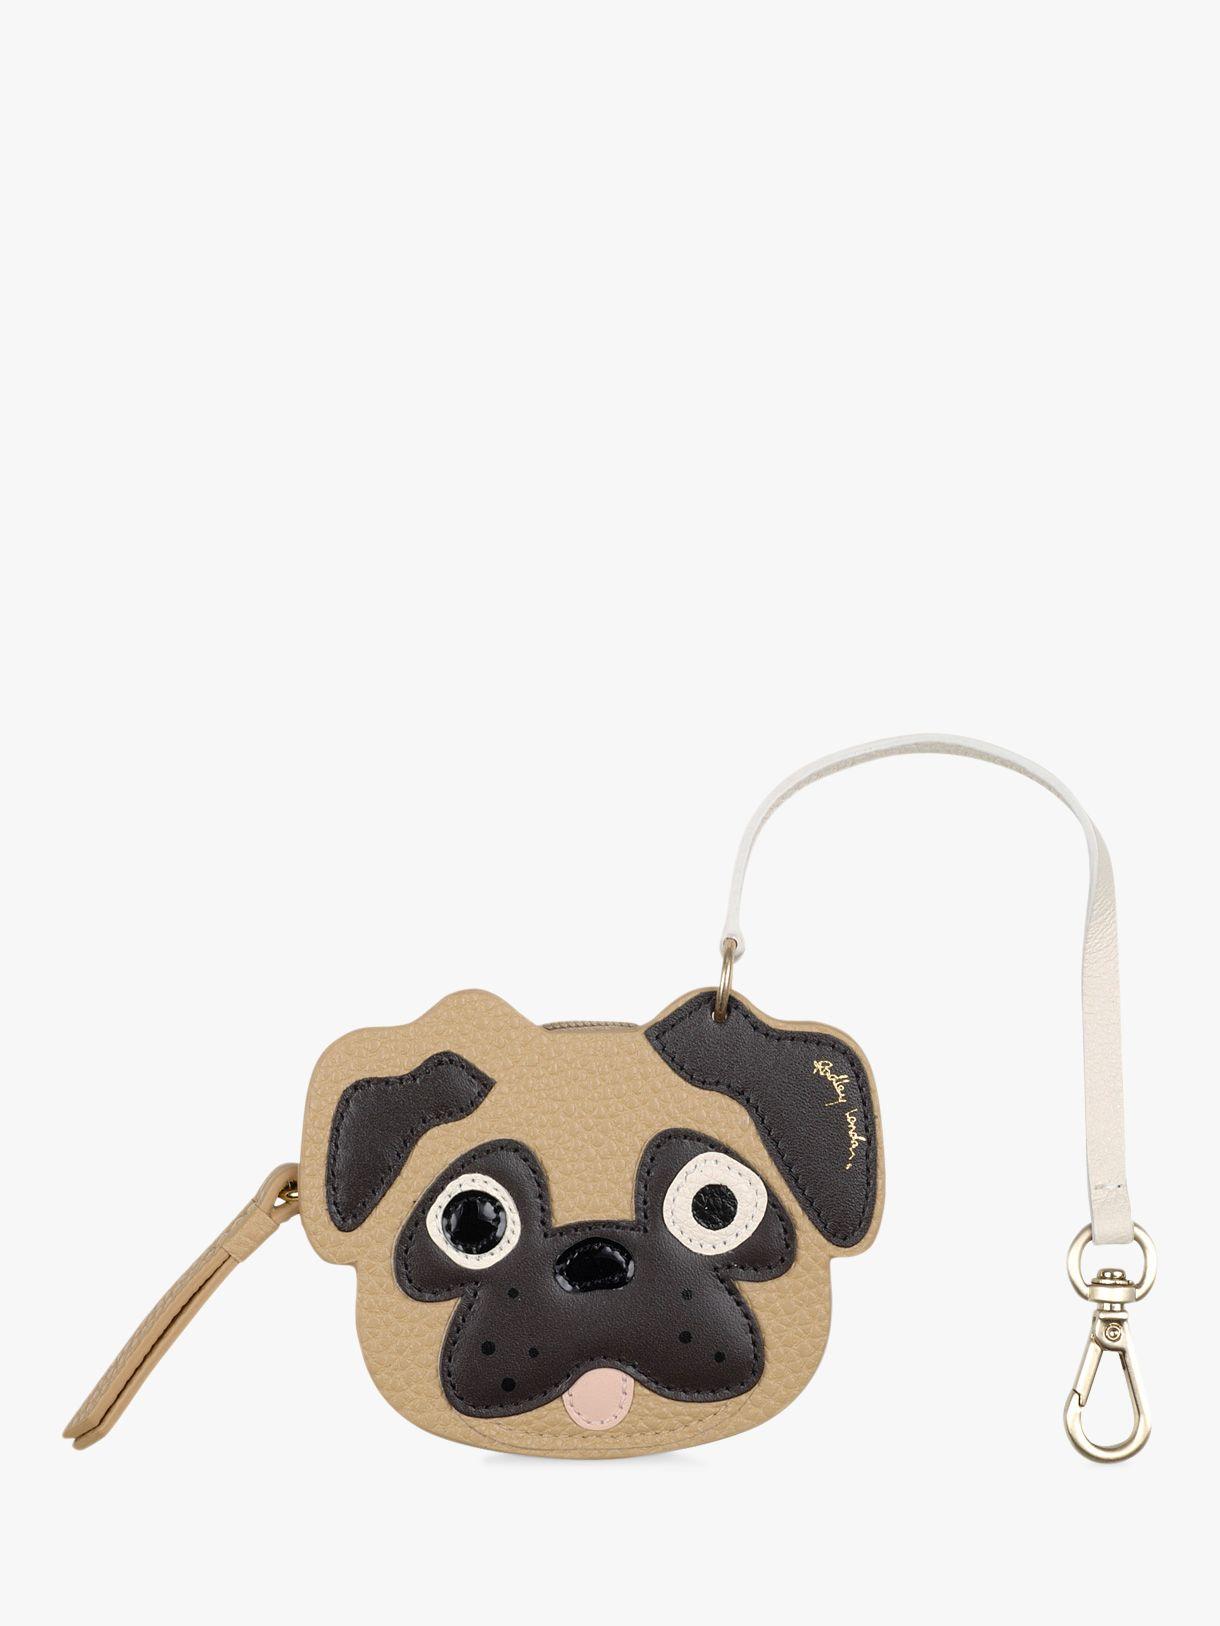 Radley Radley Radley & Friends Leather Pug Bag Charm, Sand